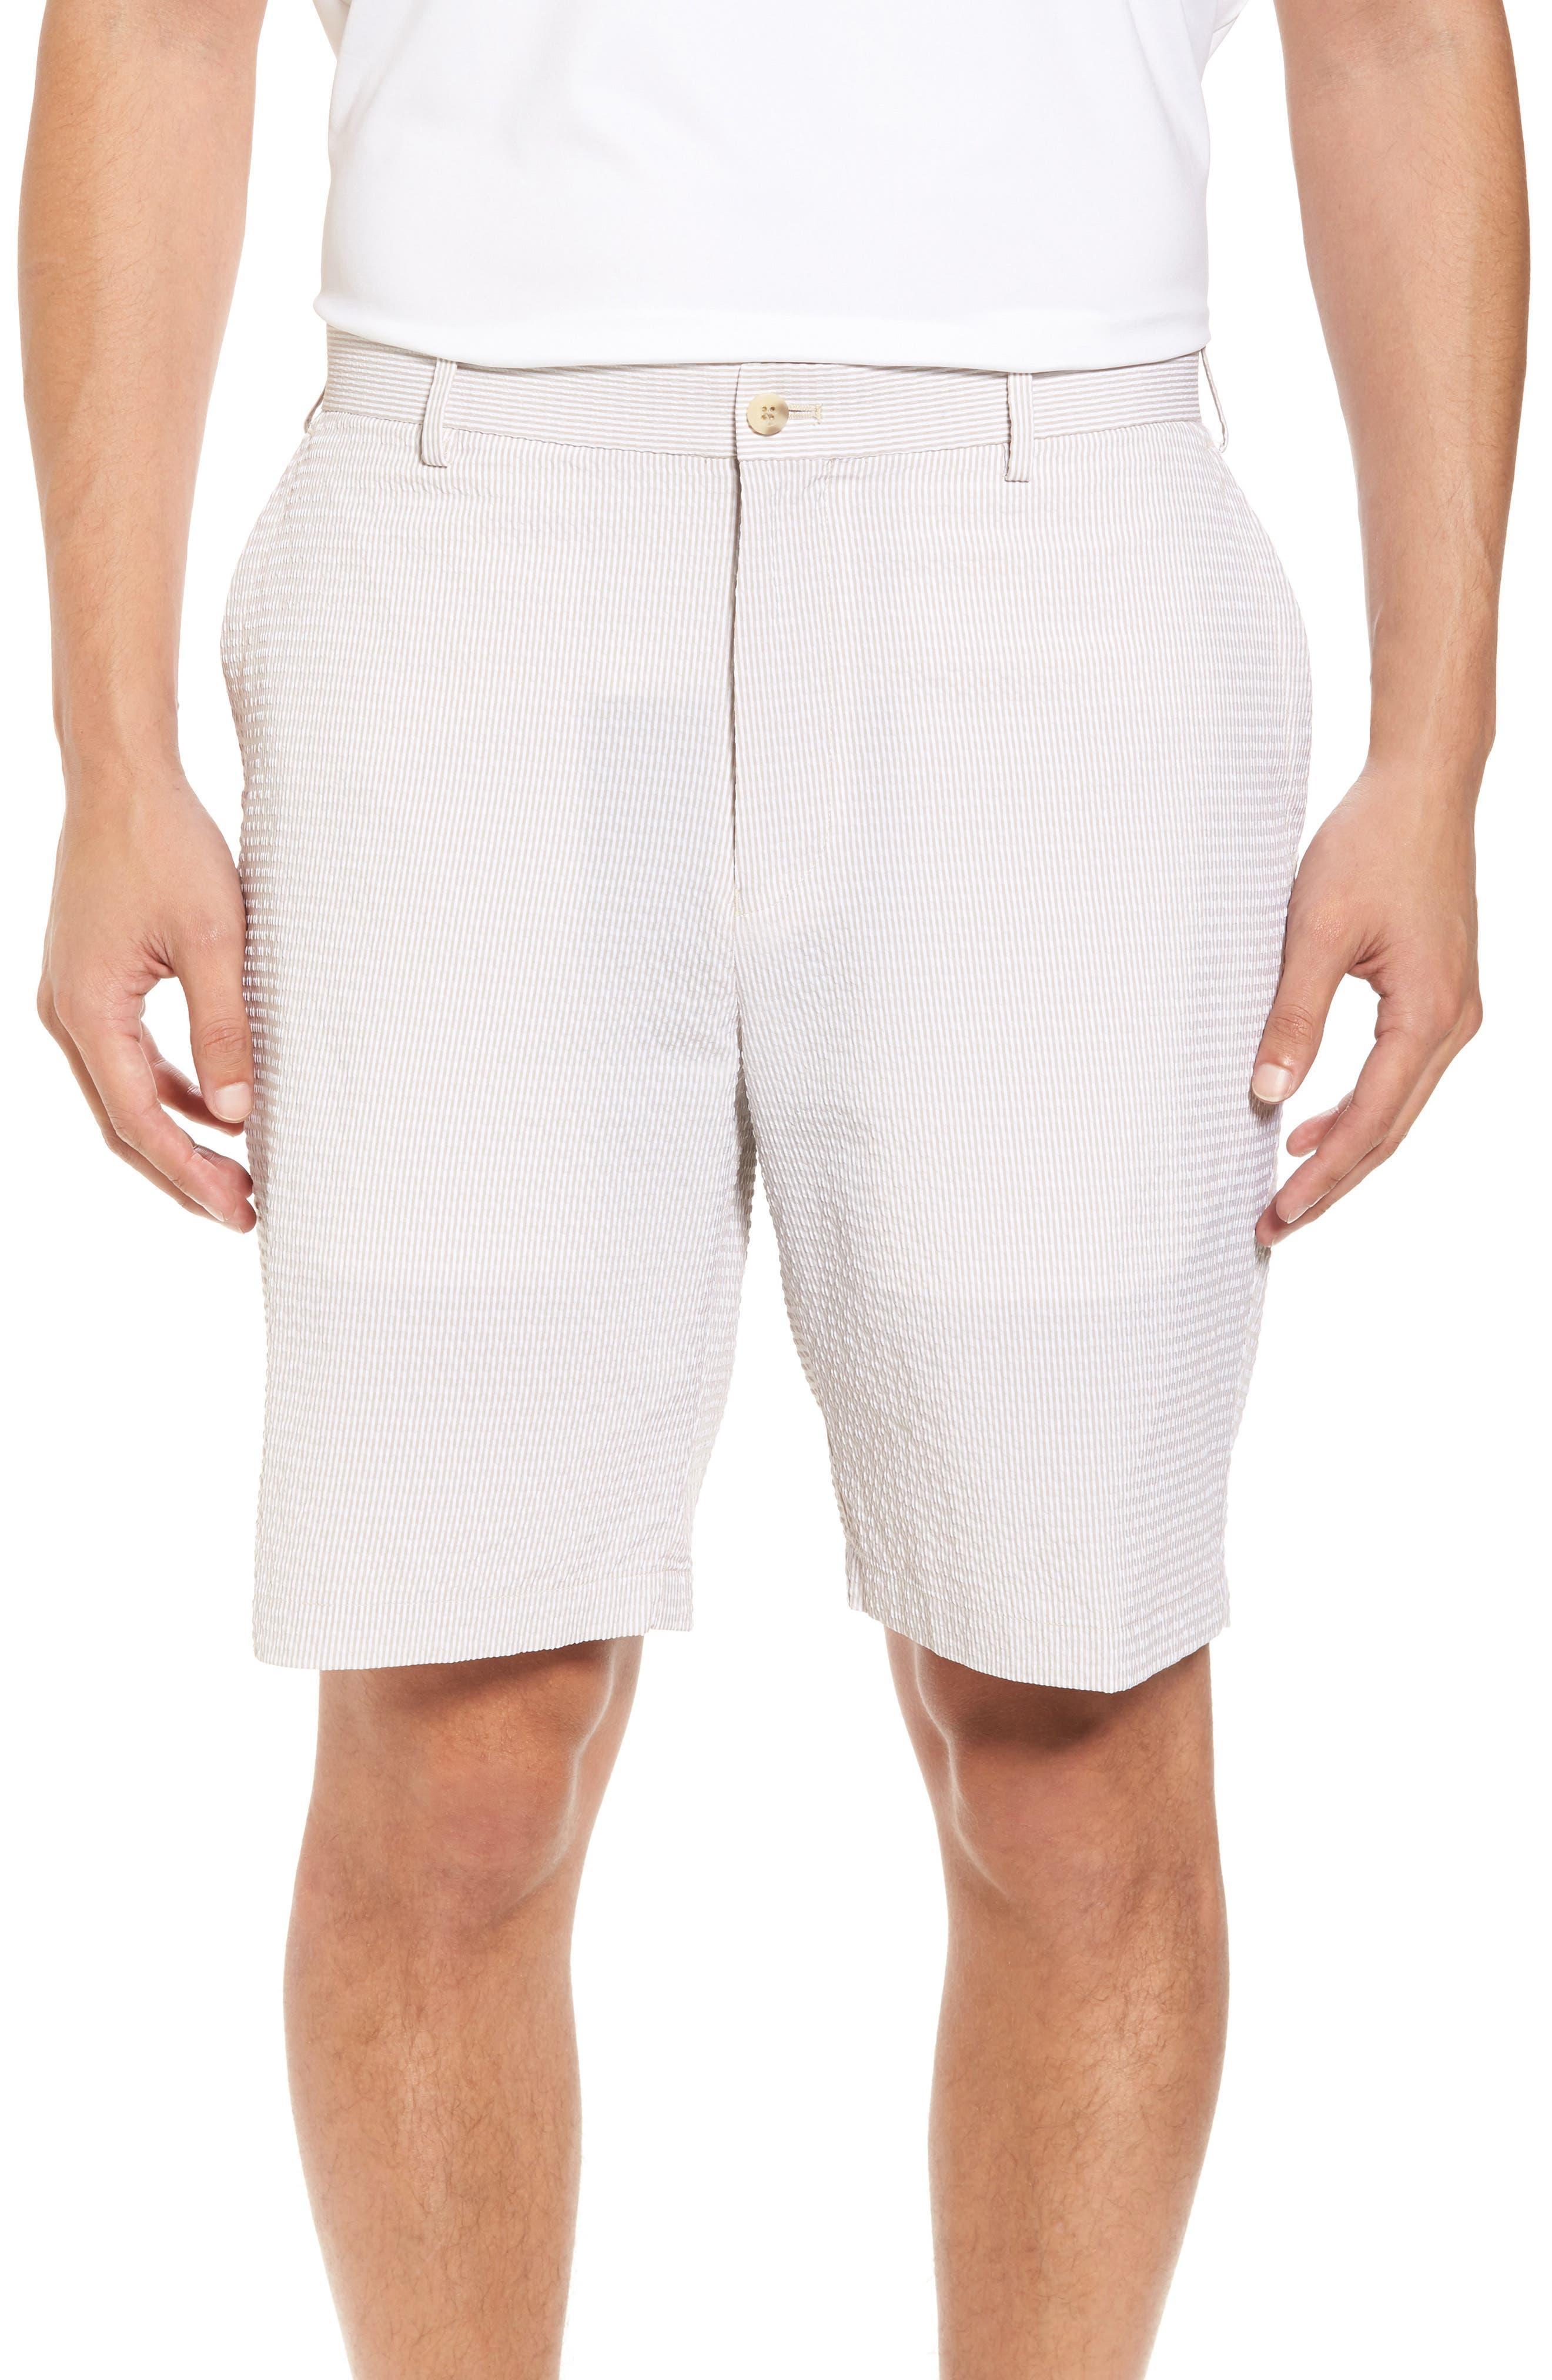 Apex Pinstripe Seersucker Shorts,                             Main thumbnail 1, color,                             Khaki